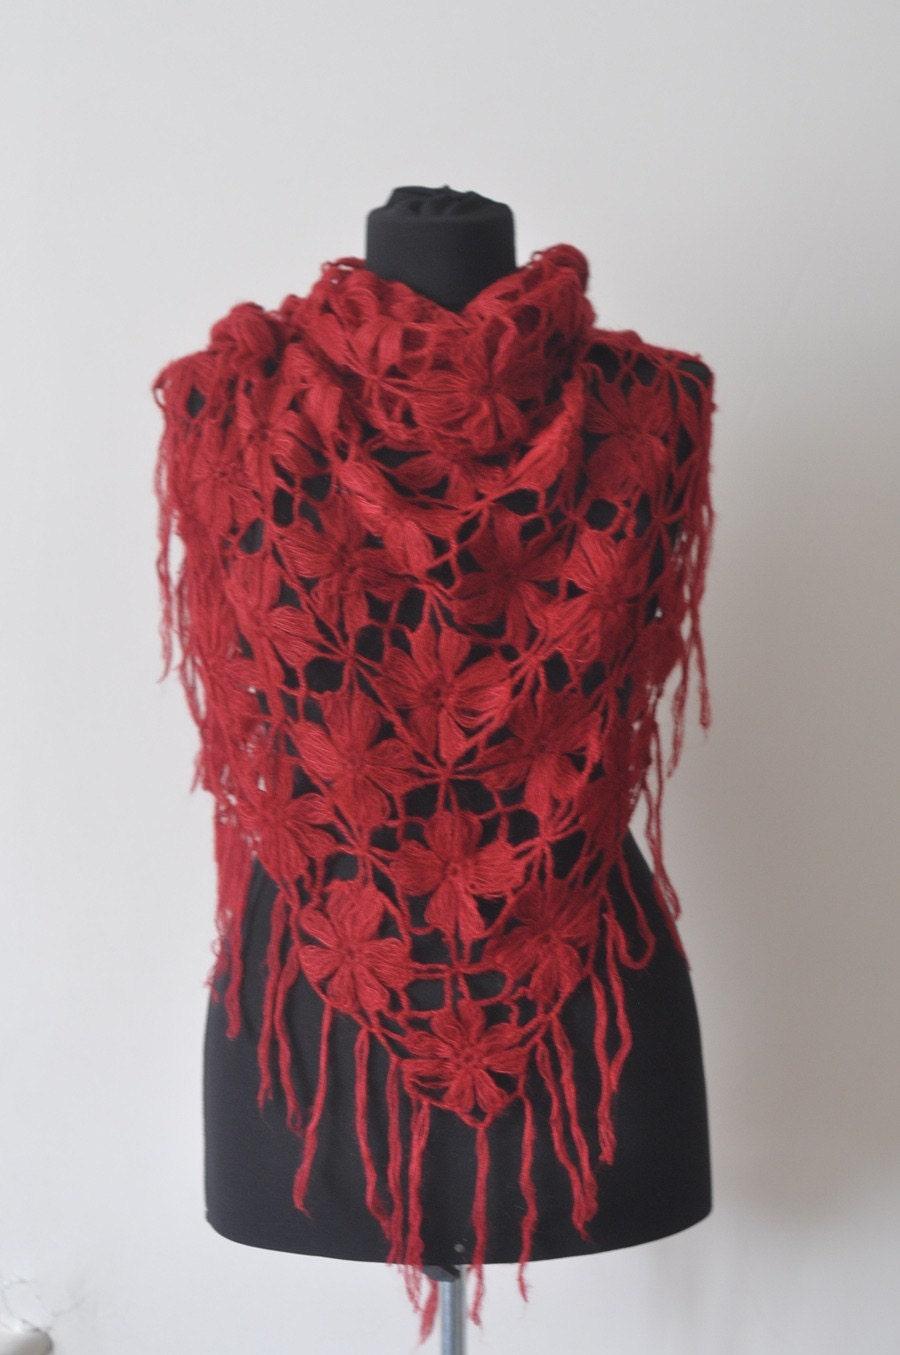 دستباف سرخ موی مرغوز توری مثلث شال شال / لباس عروس / کریسمس هدیه